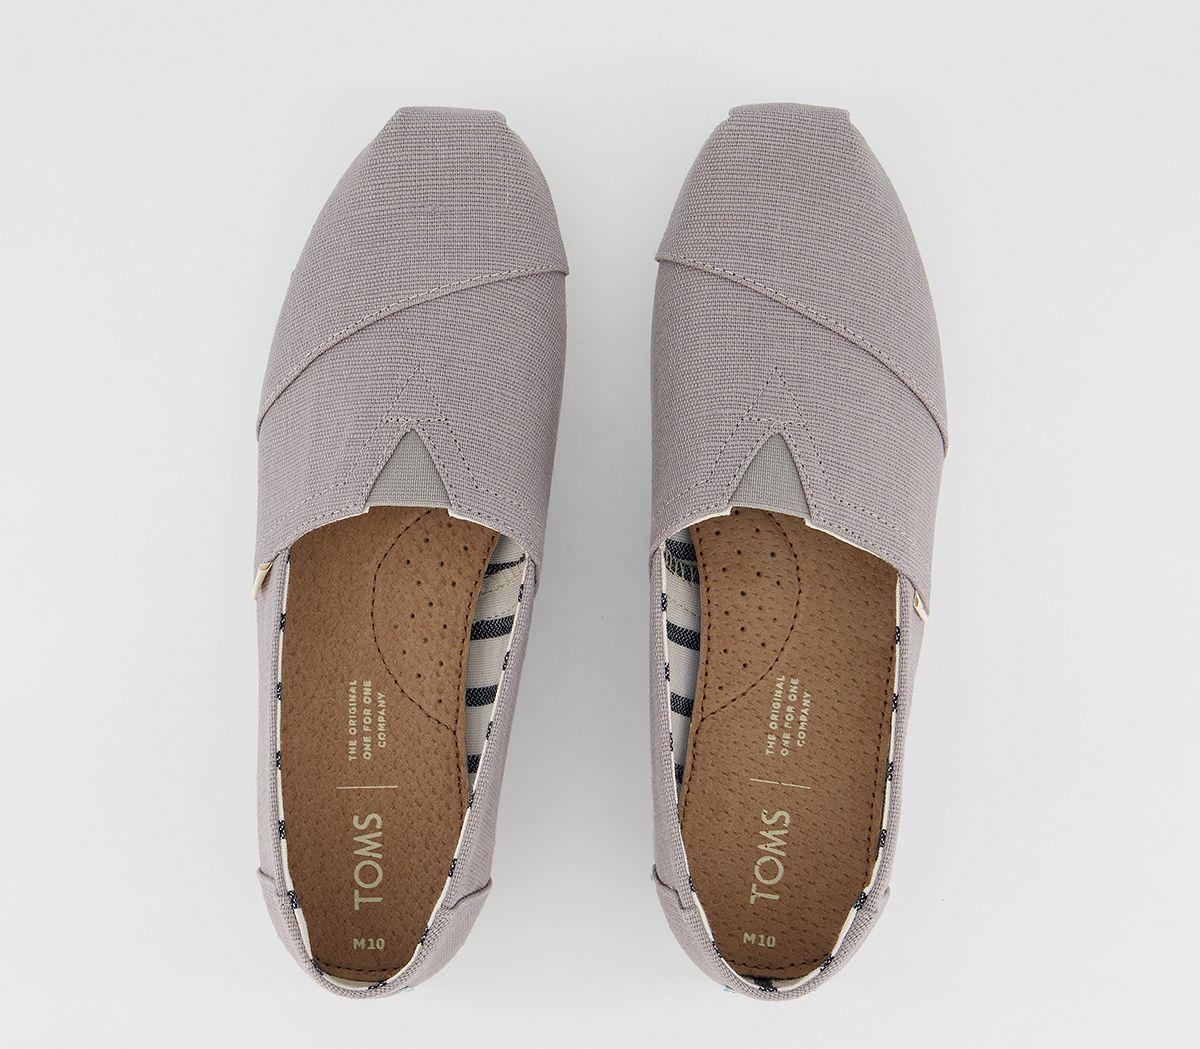 Da-Uomo-Toms-Toms-Classic-SLIP-ONS-TORTORA-Heritage-Scarpe-Casual miniatura 5